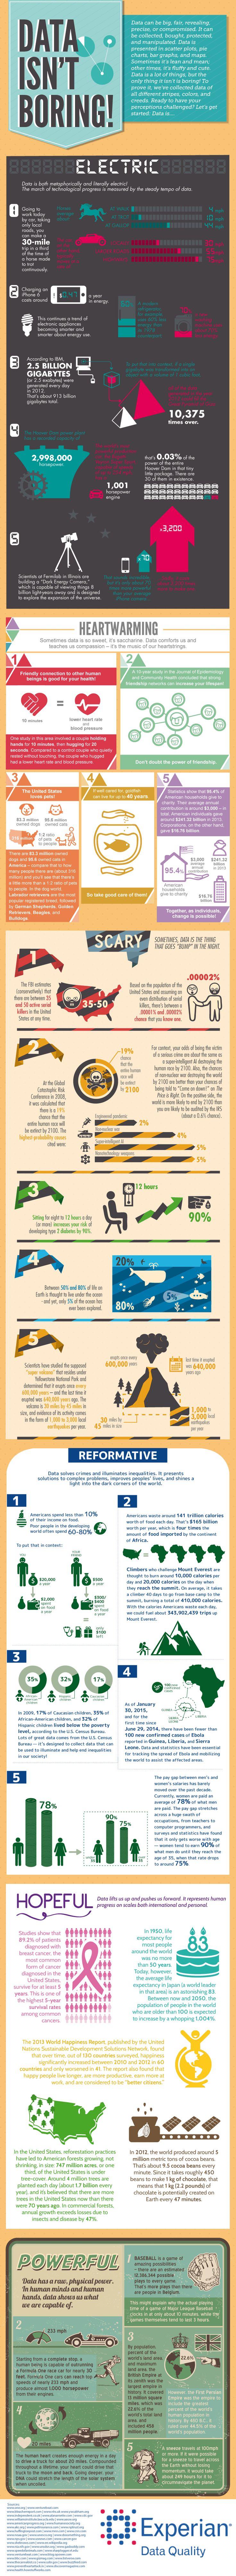 Data Isn't Boring! #infographic #Data #Science